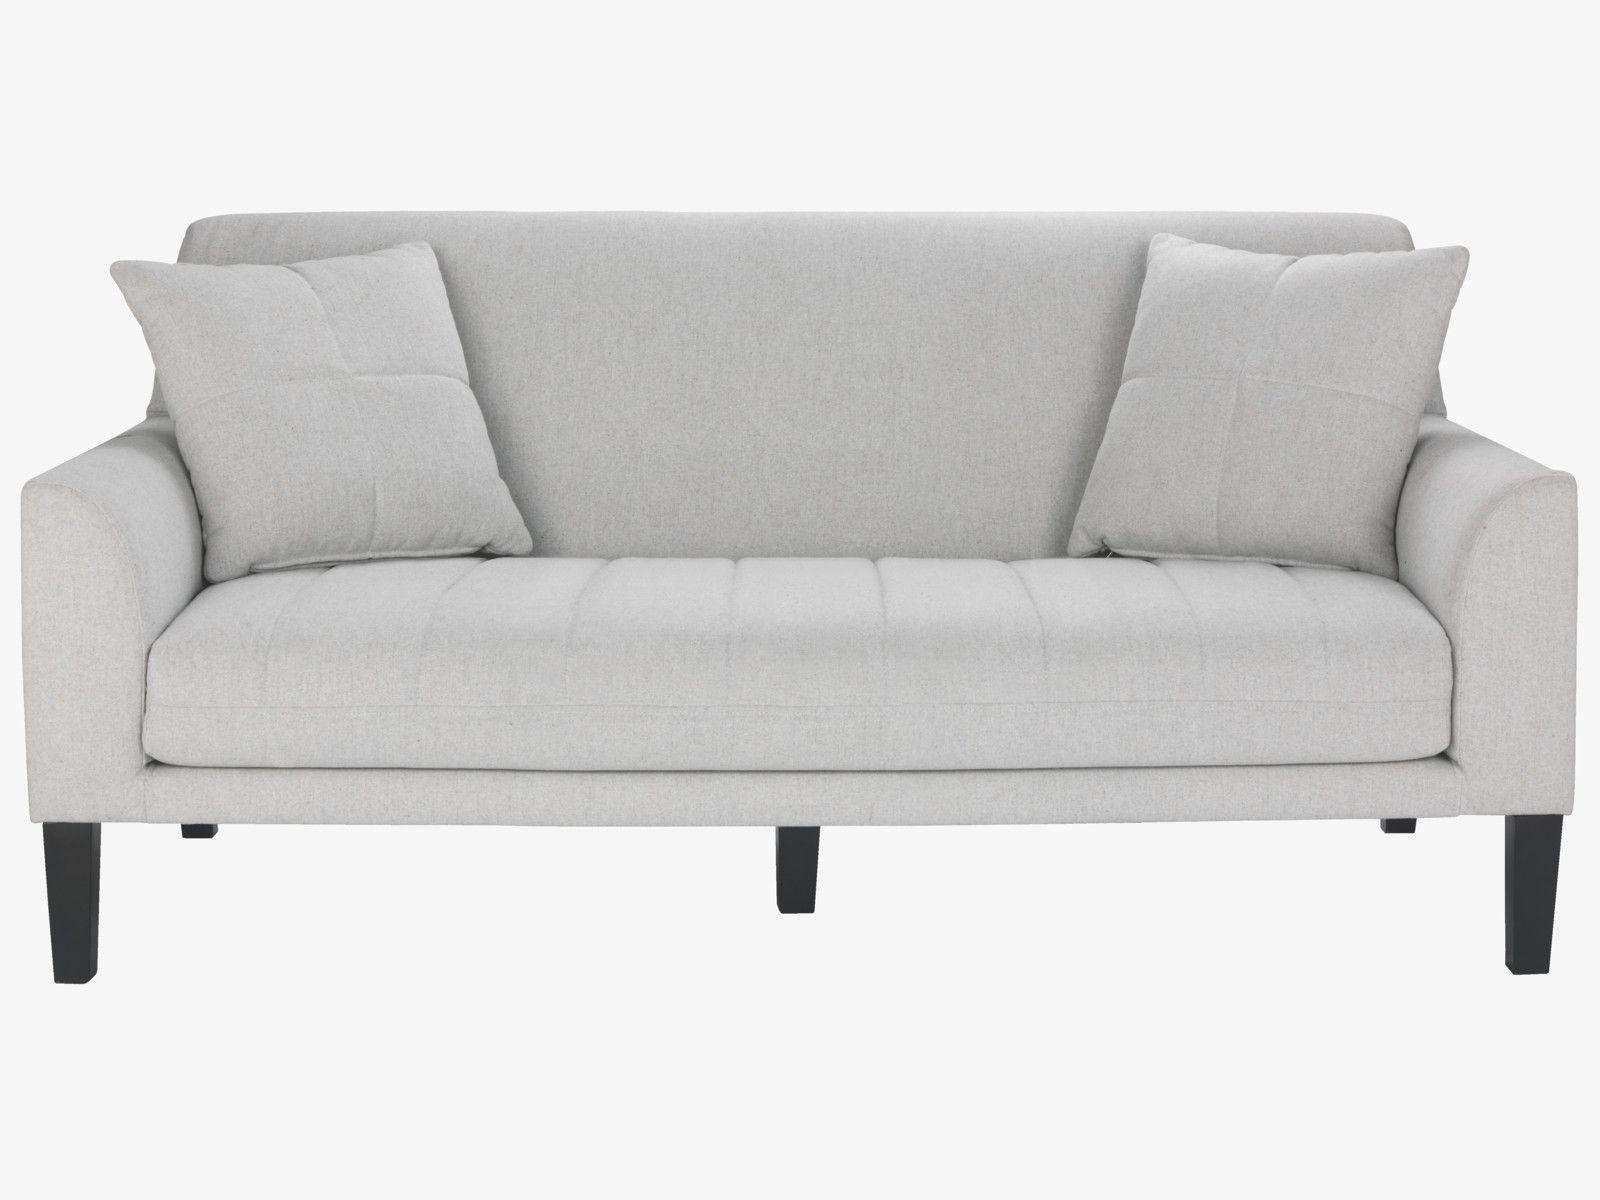 Bun Neutral Fabric Natural Wool 2 Seat Sofa Habitatuk Sofa Furniture 2 Seater Sofa Sofa